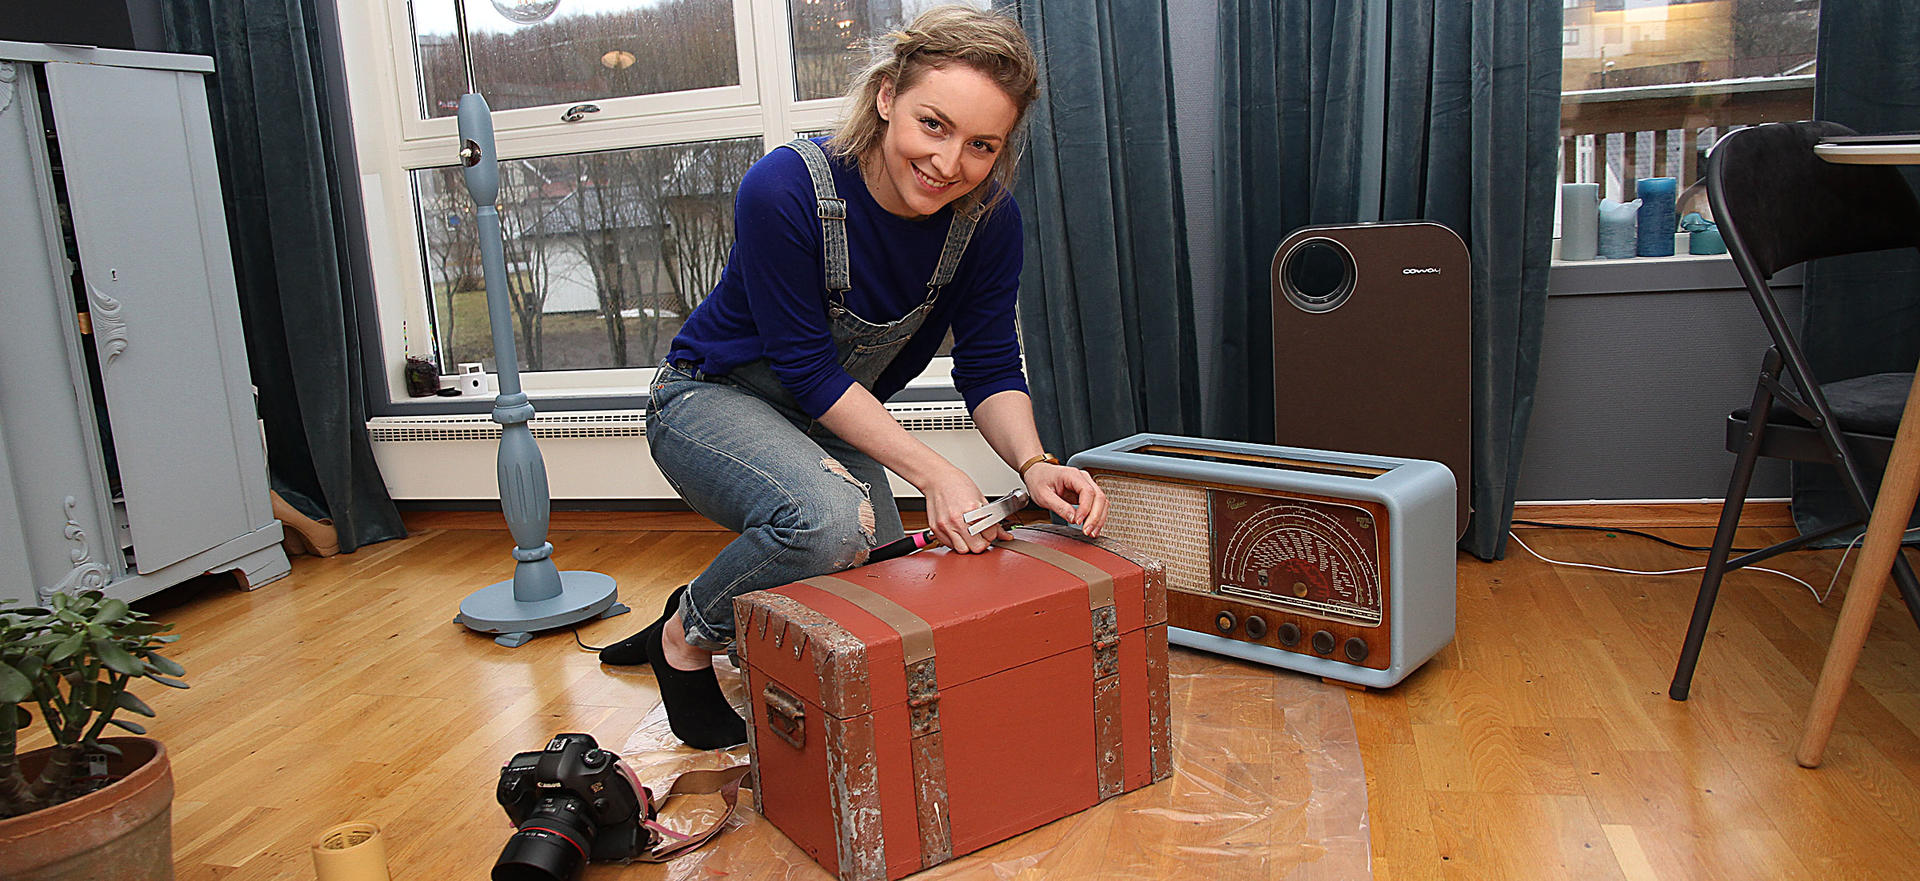 Marthe Mølstre